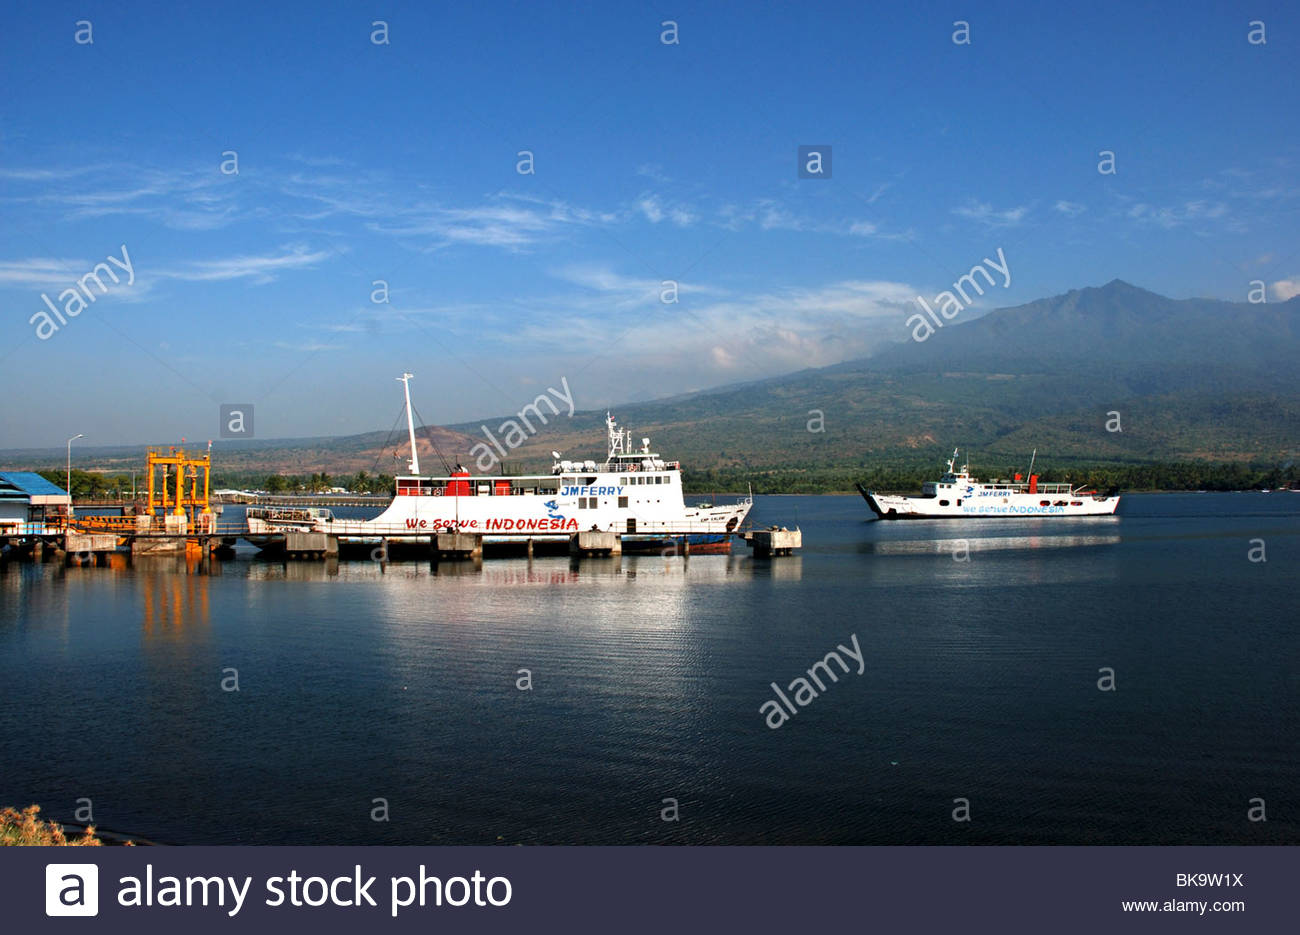 Ferryboats at terminal with Gunung Rinjani volcano in background Kayangan Labuan Lombok Lombok Timur NTB Indonesia - Stock Image